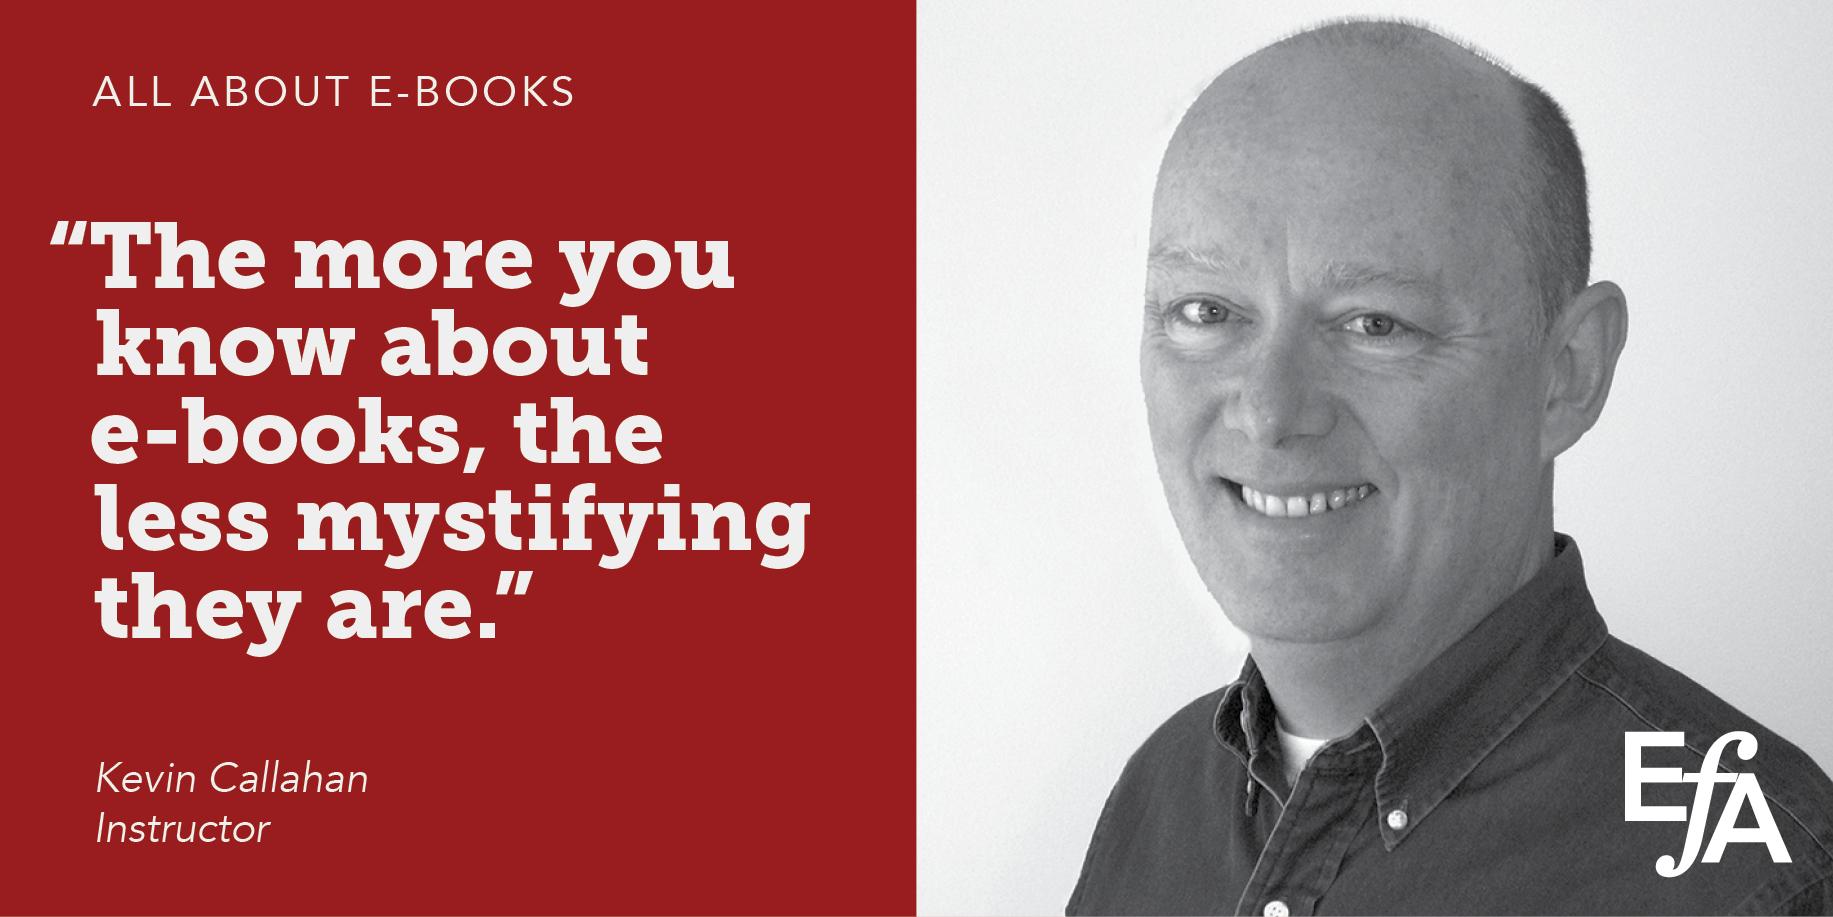 callahan_allaboute-books